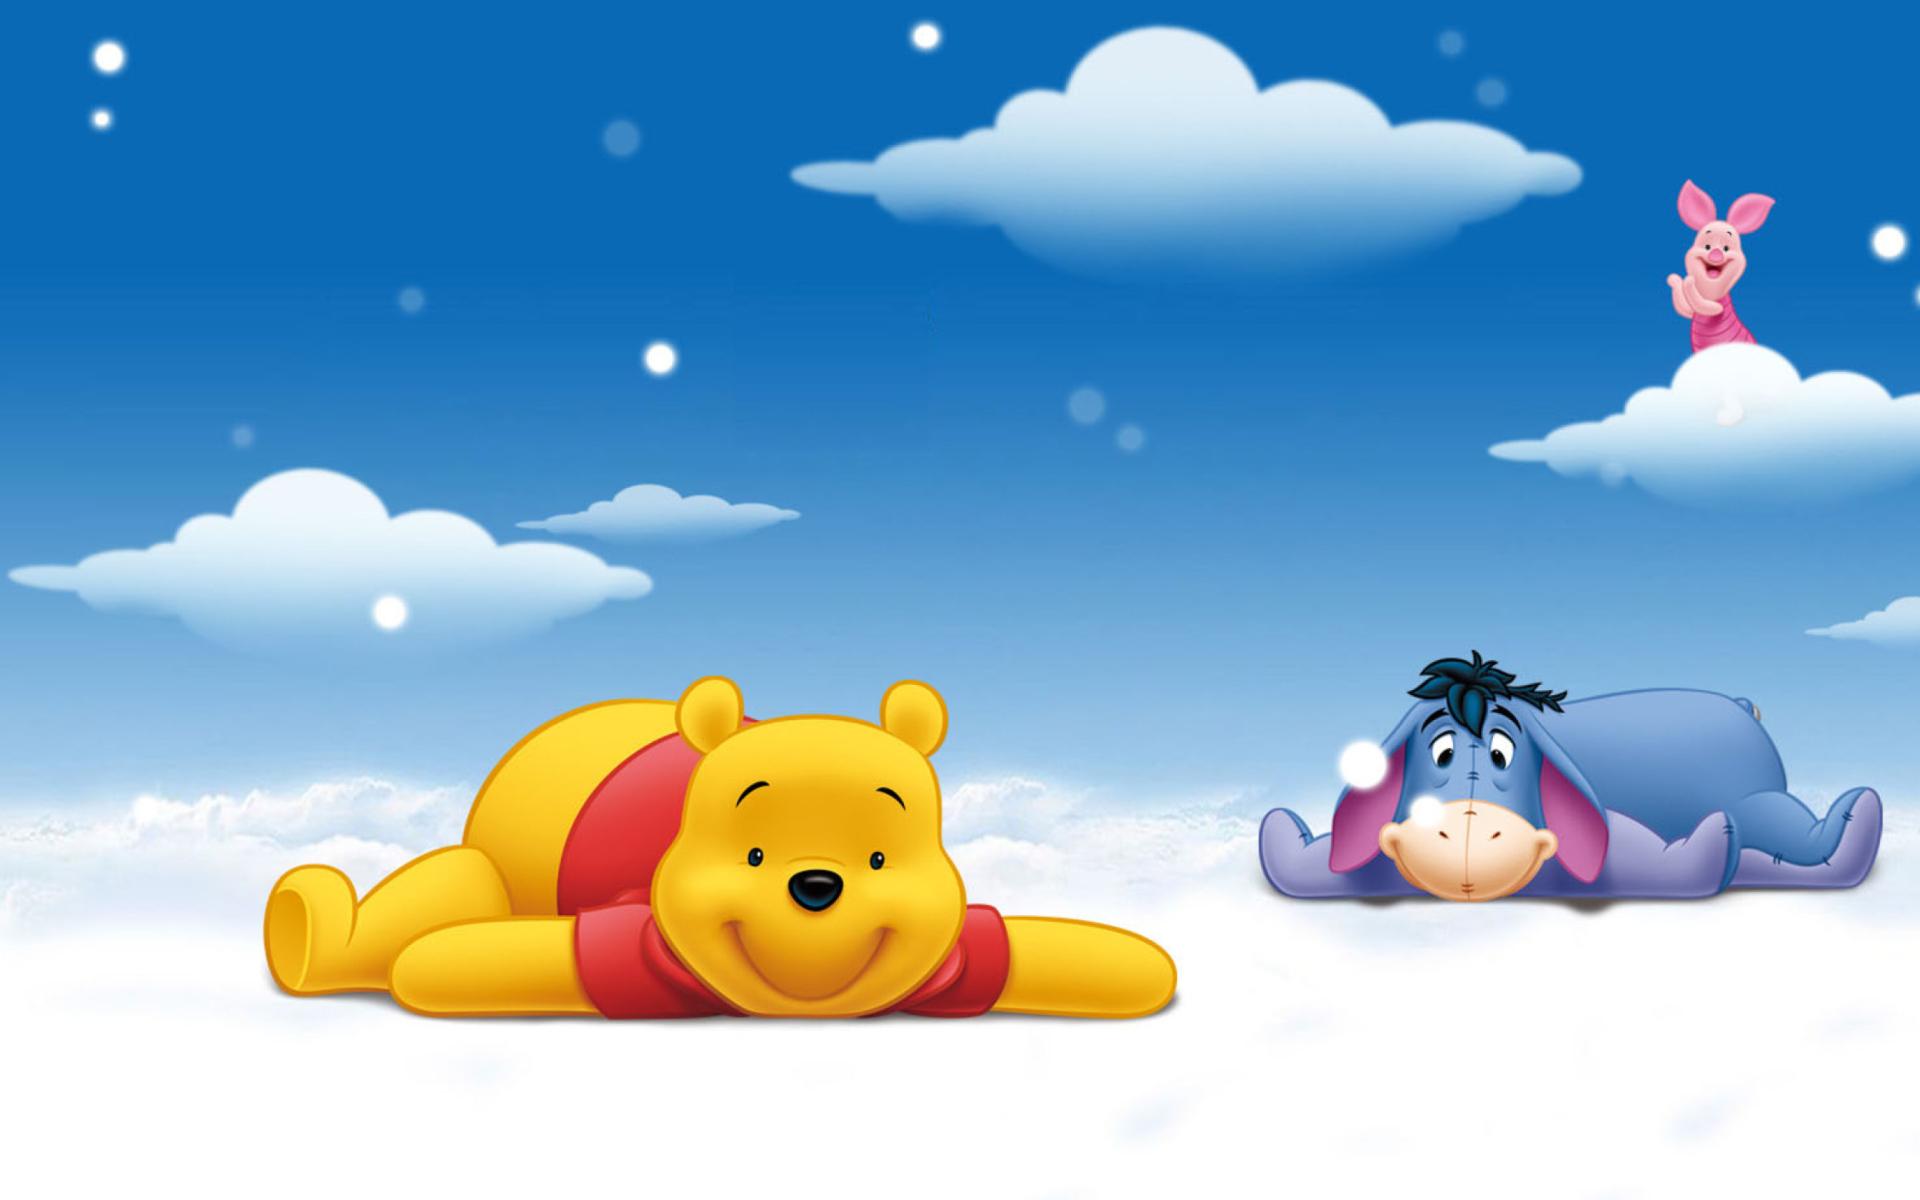 Winnie the pooh fondos de pantalla gratis para for Protectores animados